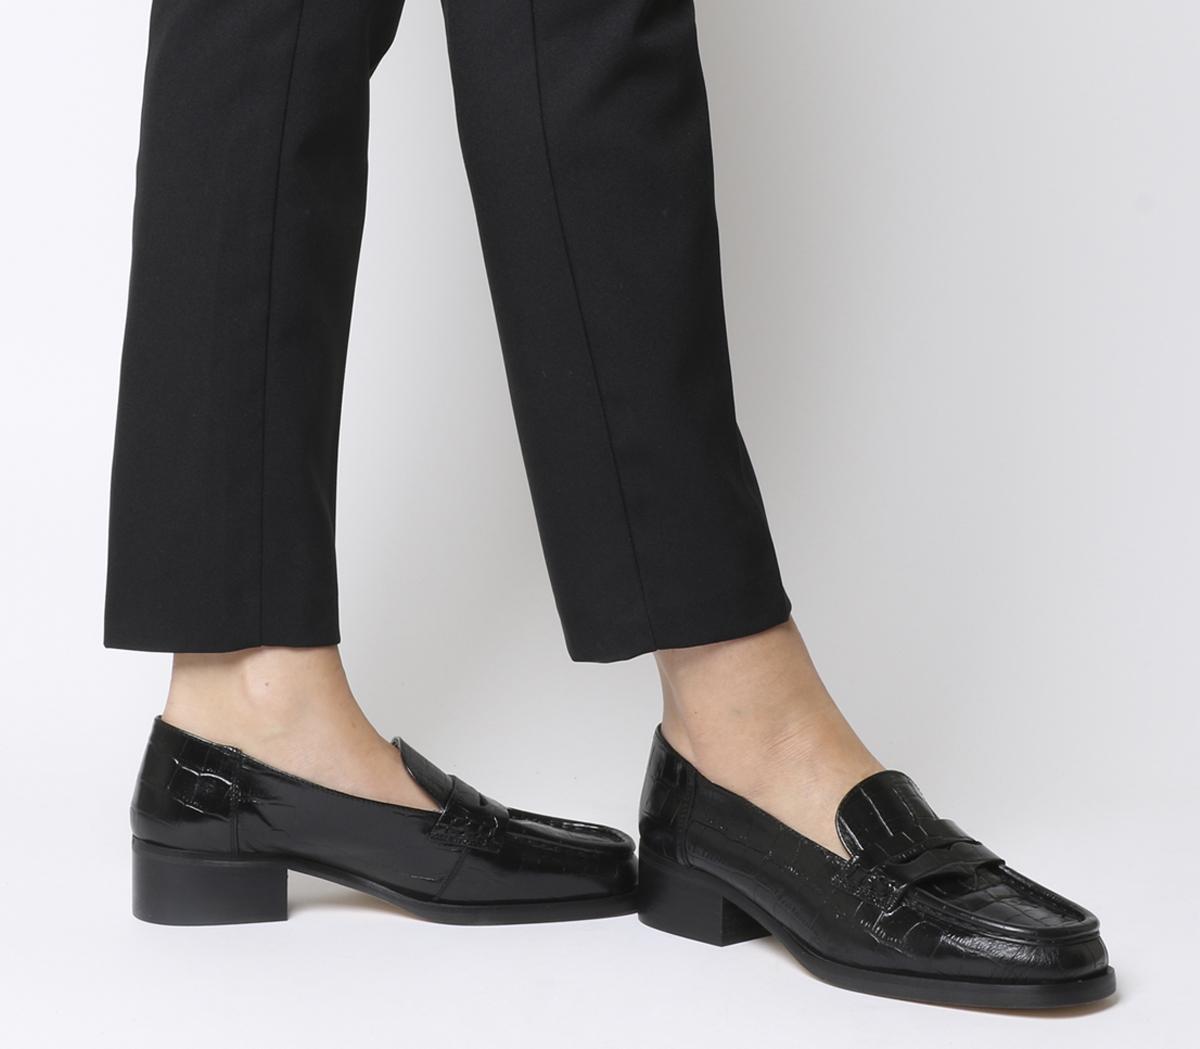 Fashion Show Square Toe Loafers